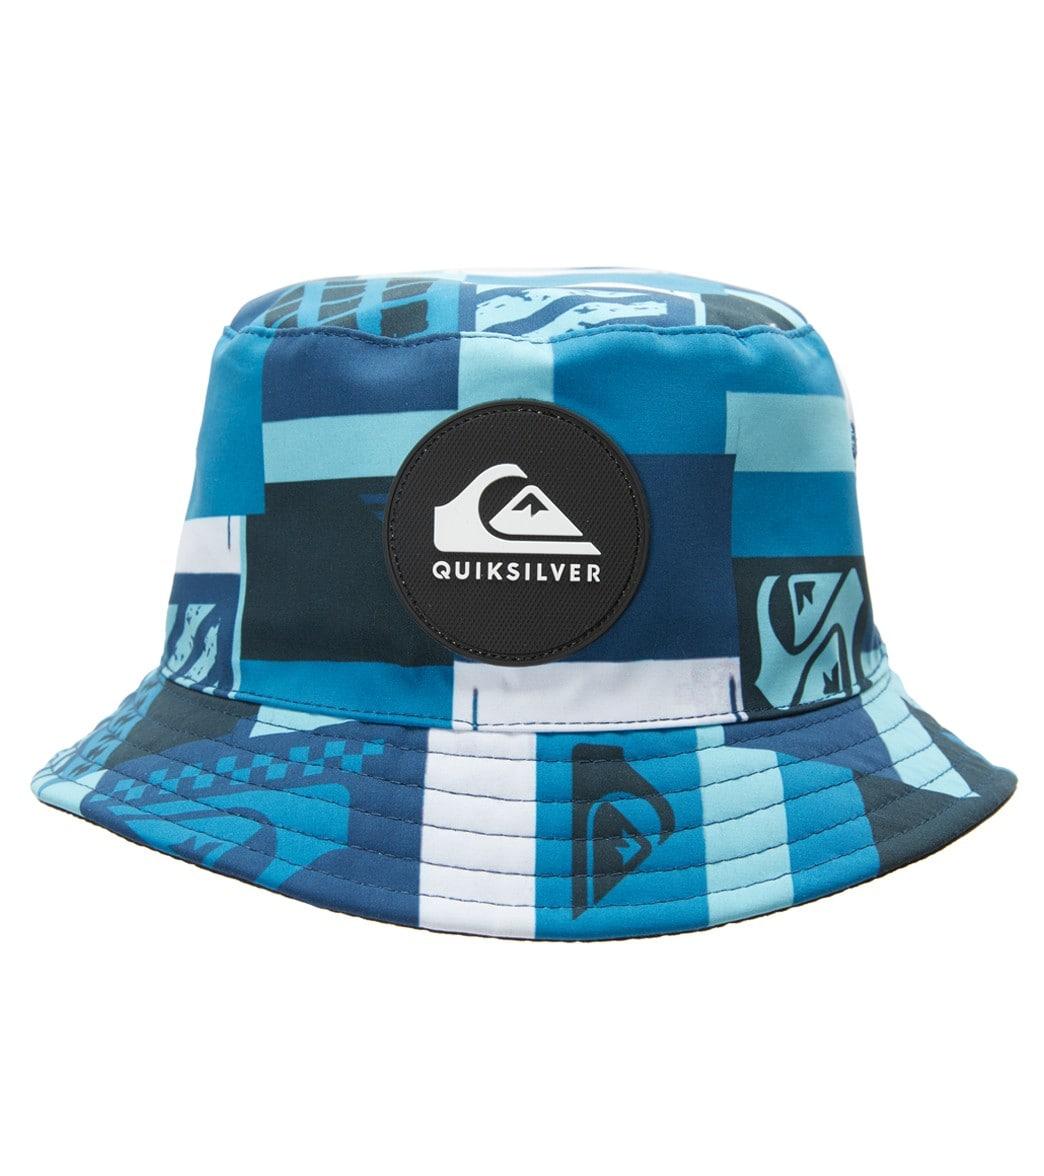 0b4200d4ca6 Quiksilver Boys  Lurkerize Bucket Hat at SwimOutlet.com